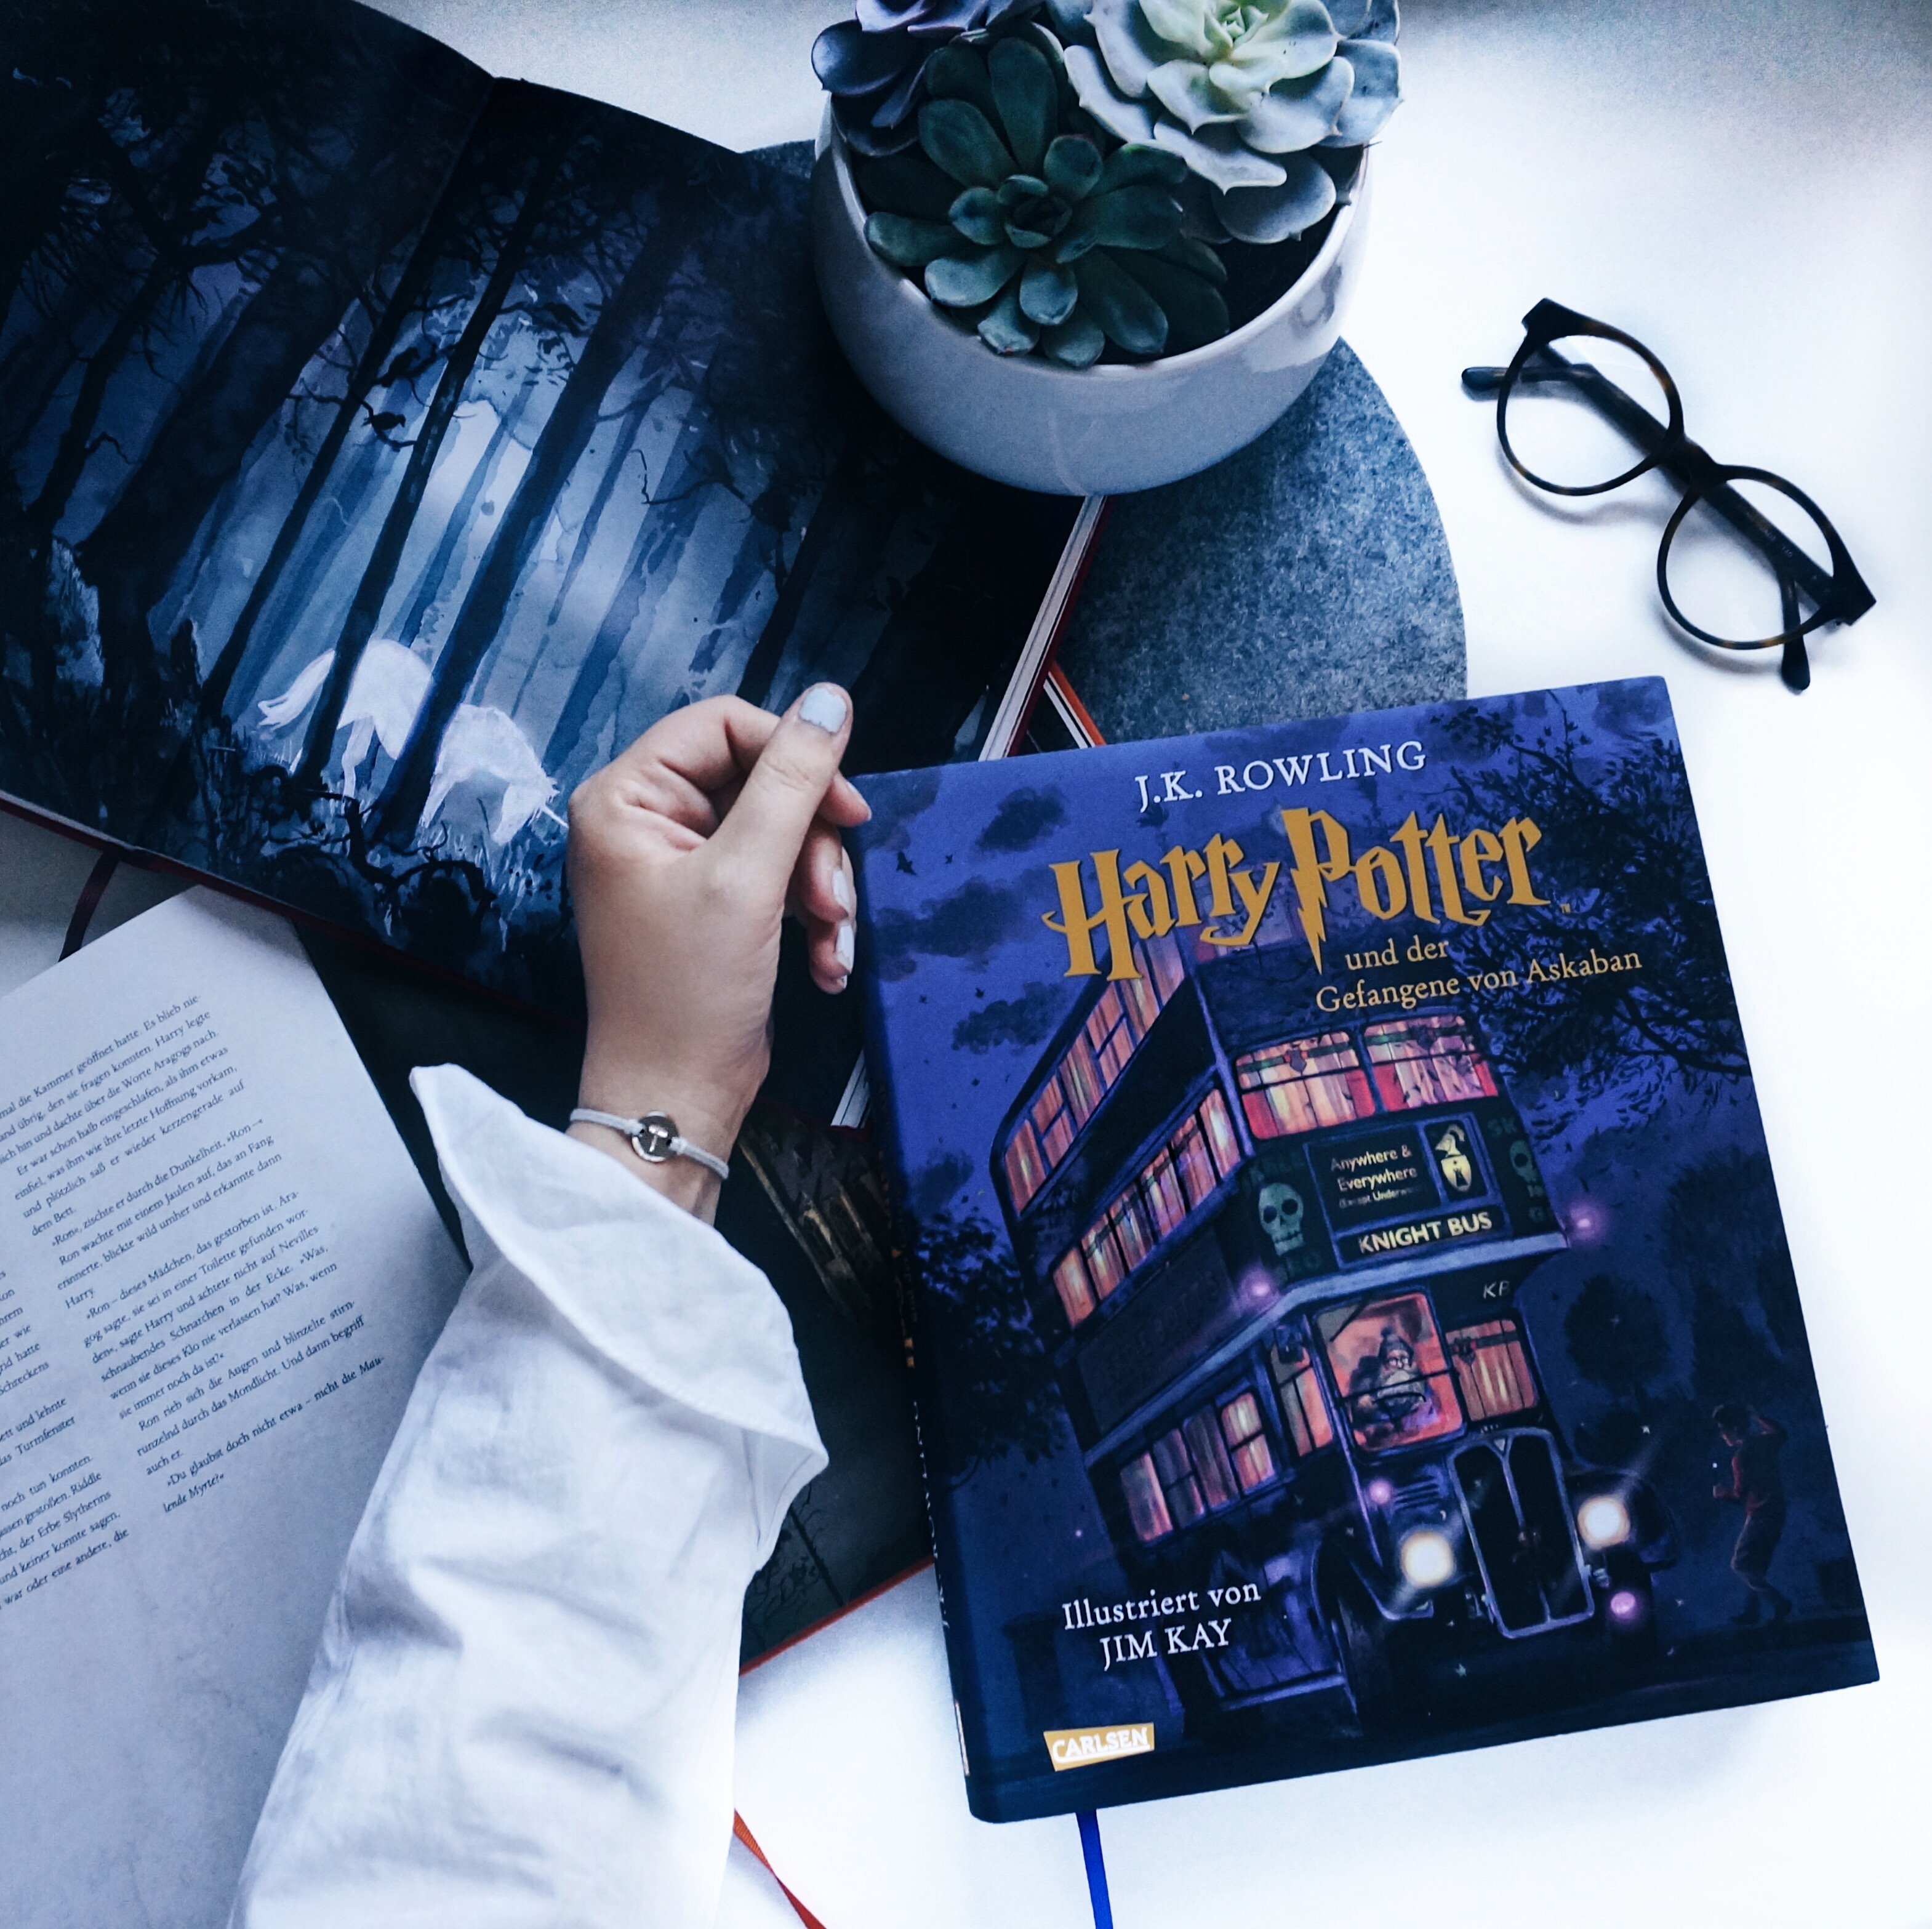 Harry Potter Geschenkidee, Buch Bilderbuch Geschenk Kinder Zauberer, Buch Bücher Geschenkidee